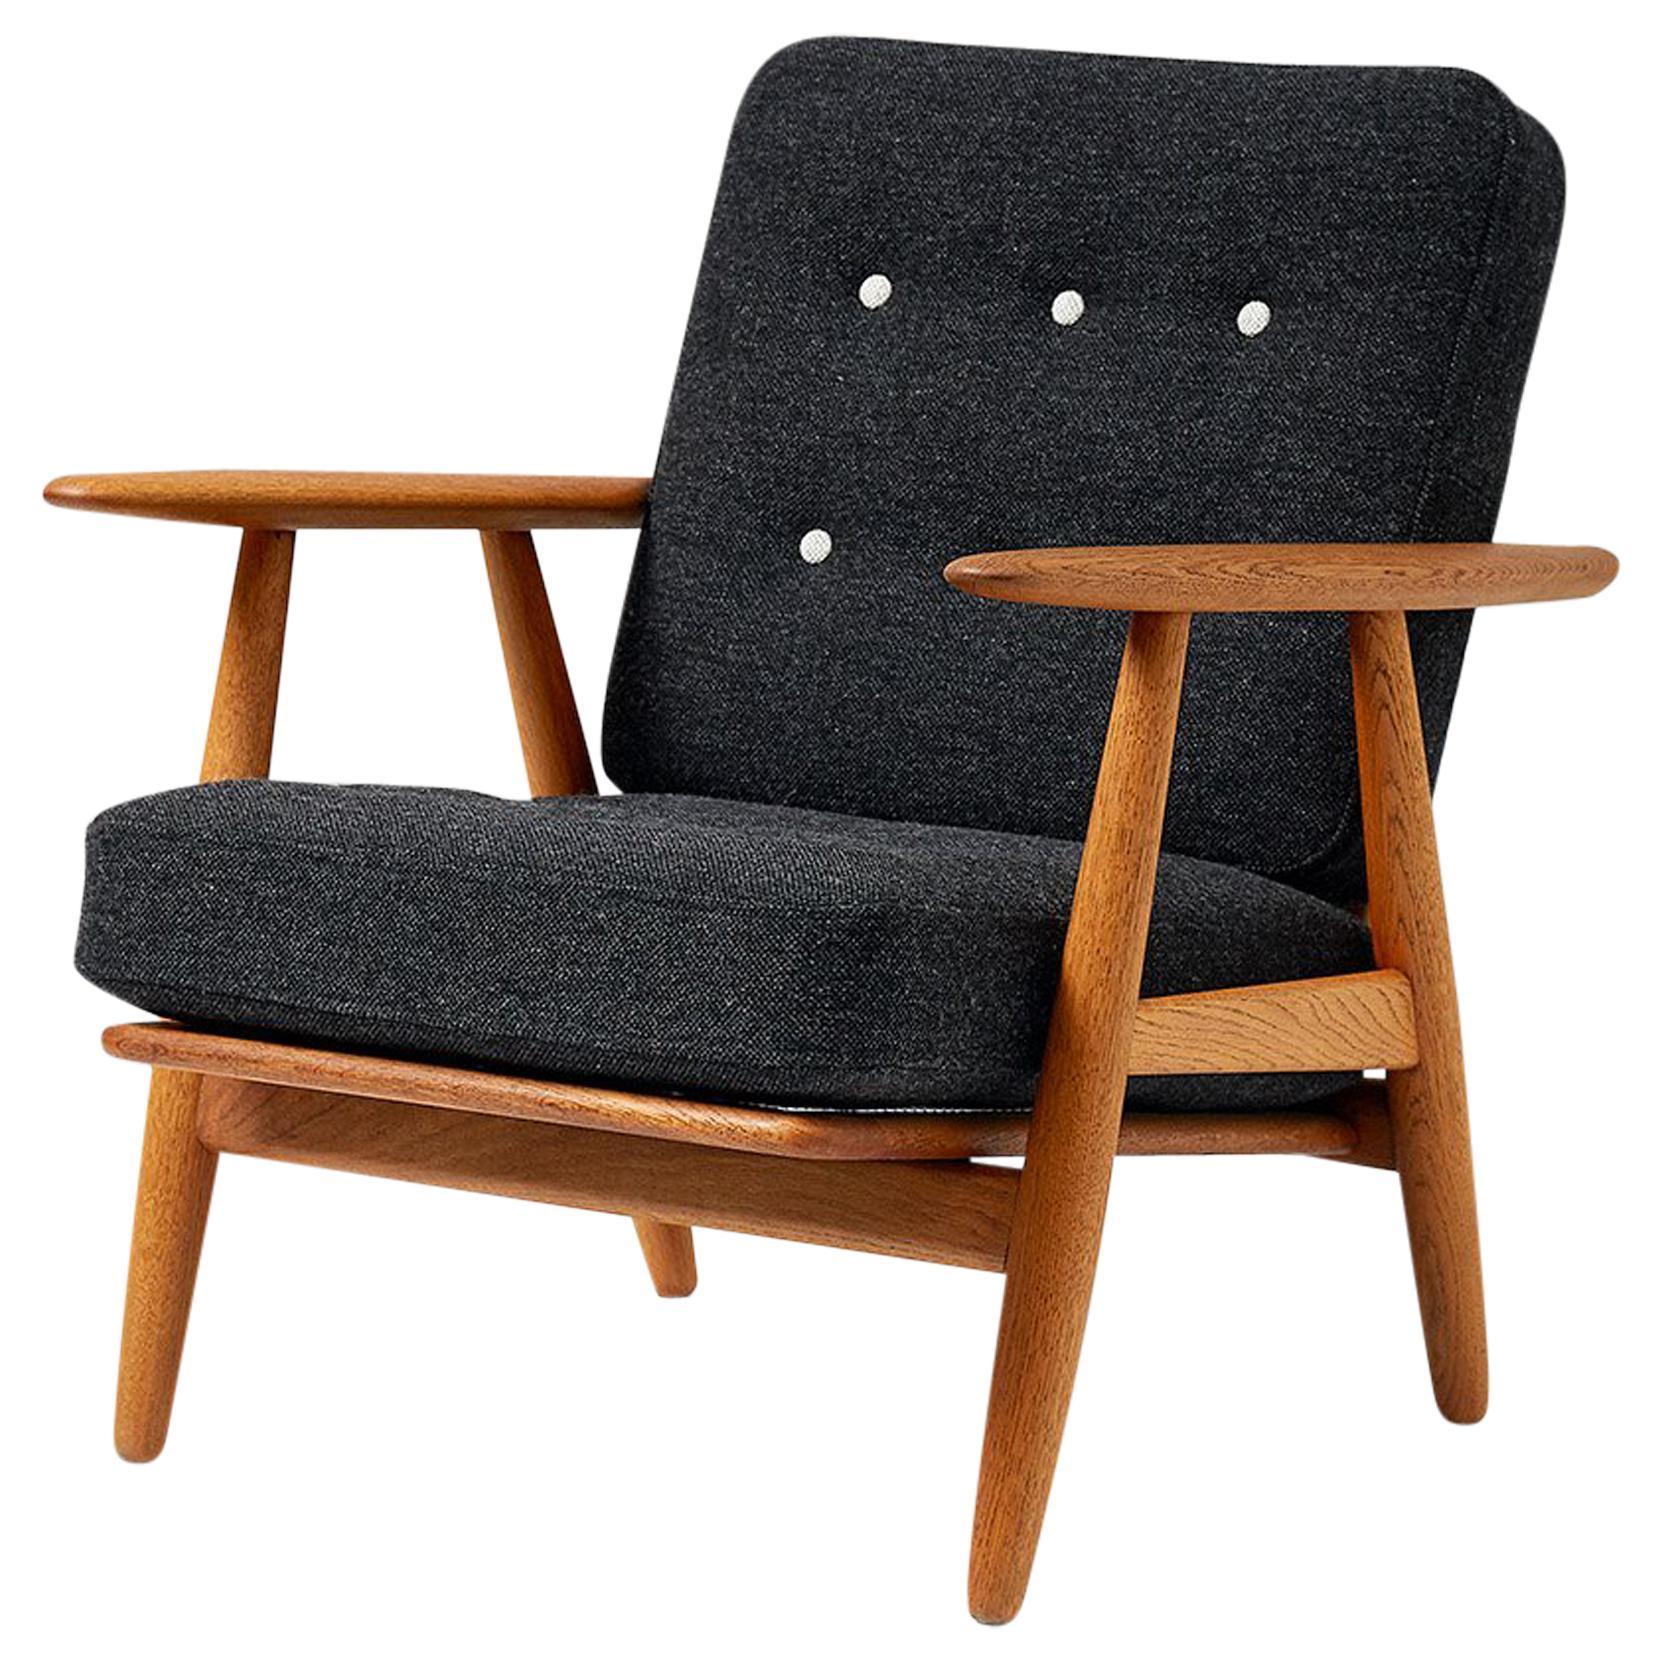 Hans J. Wegner GE-240 Oak 'Cigar' Chair, 1955